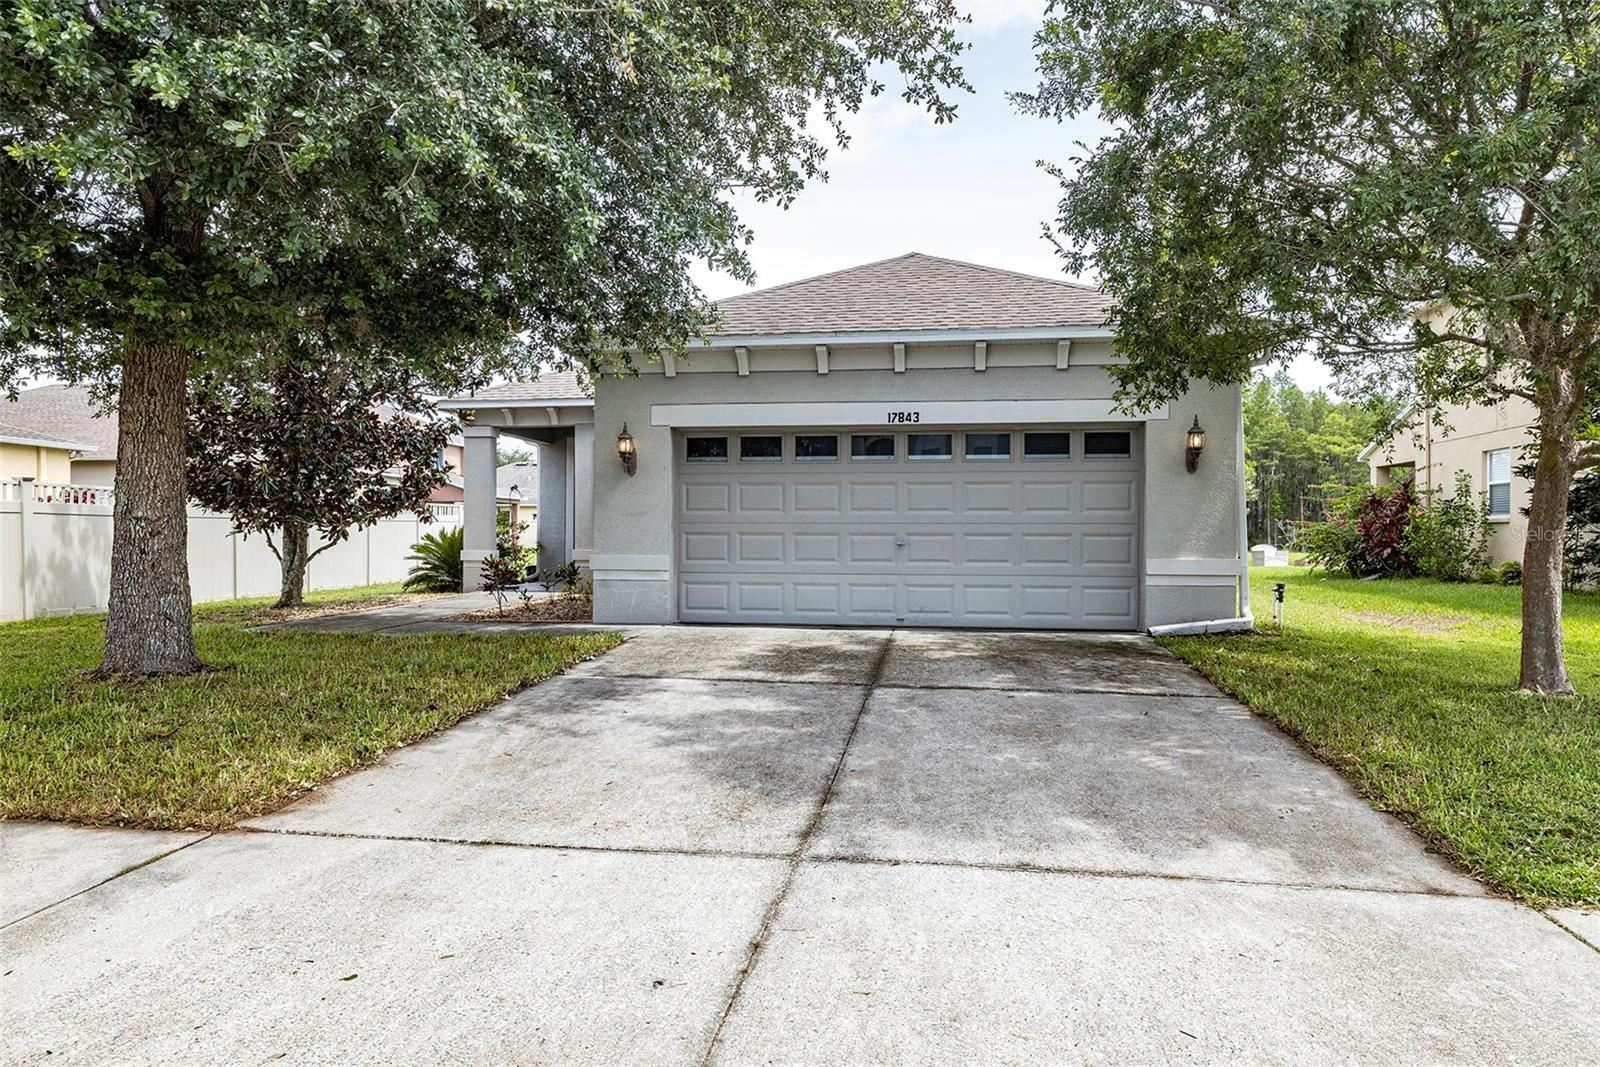 17843 CUNNINGHAM COURT, Land O Lakes, FL 34638 - MLS#: T3313632